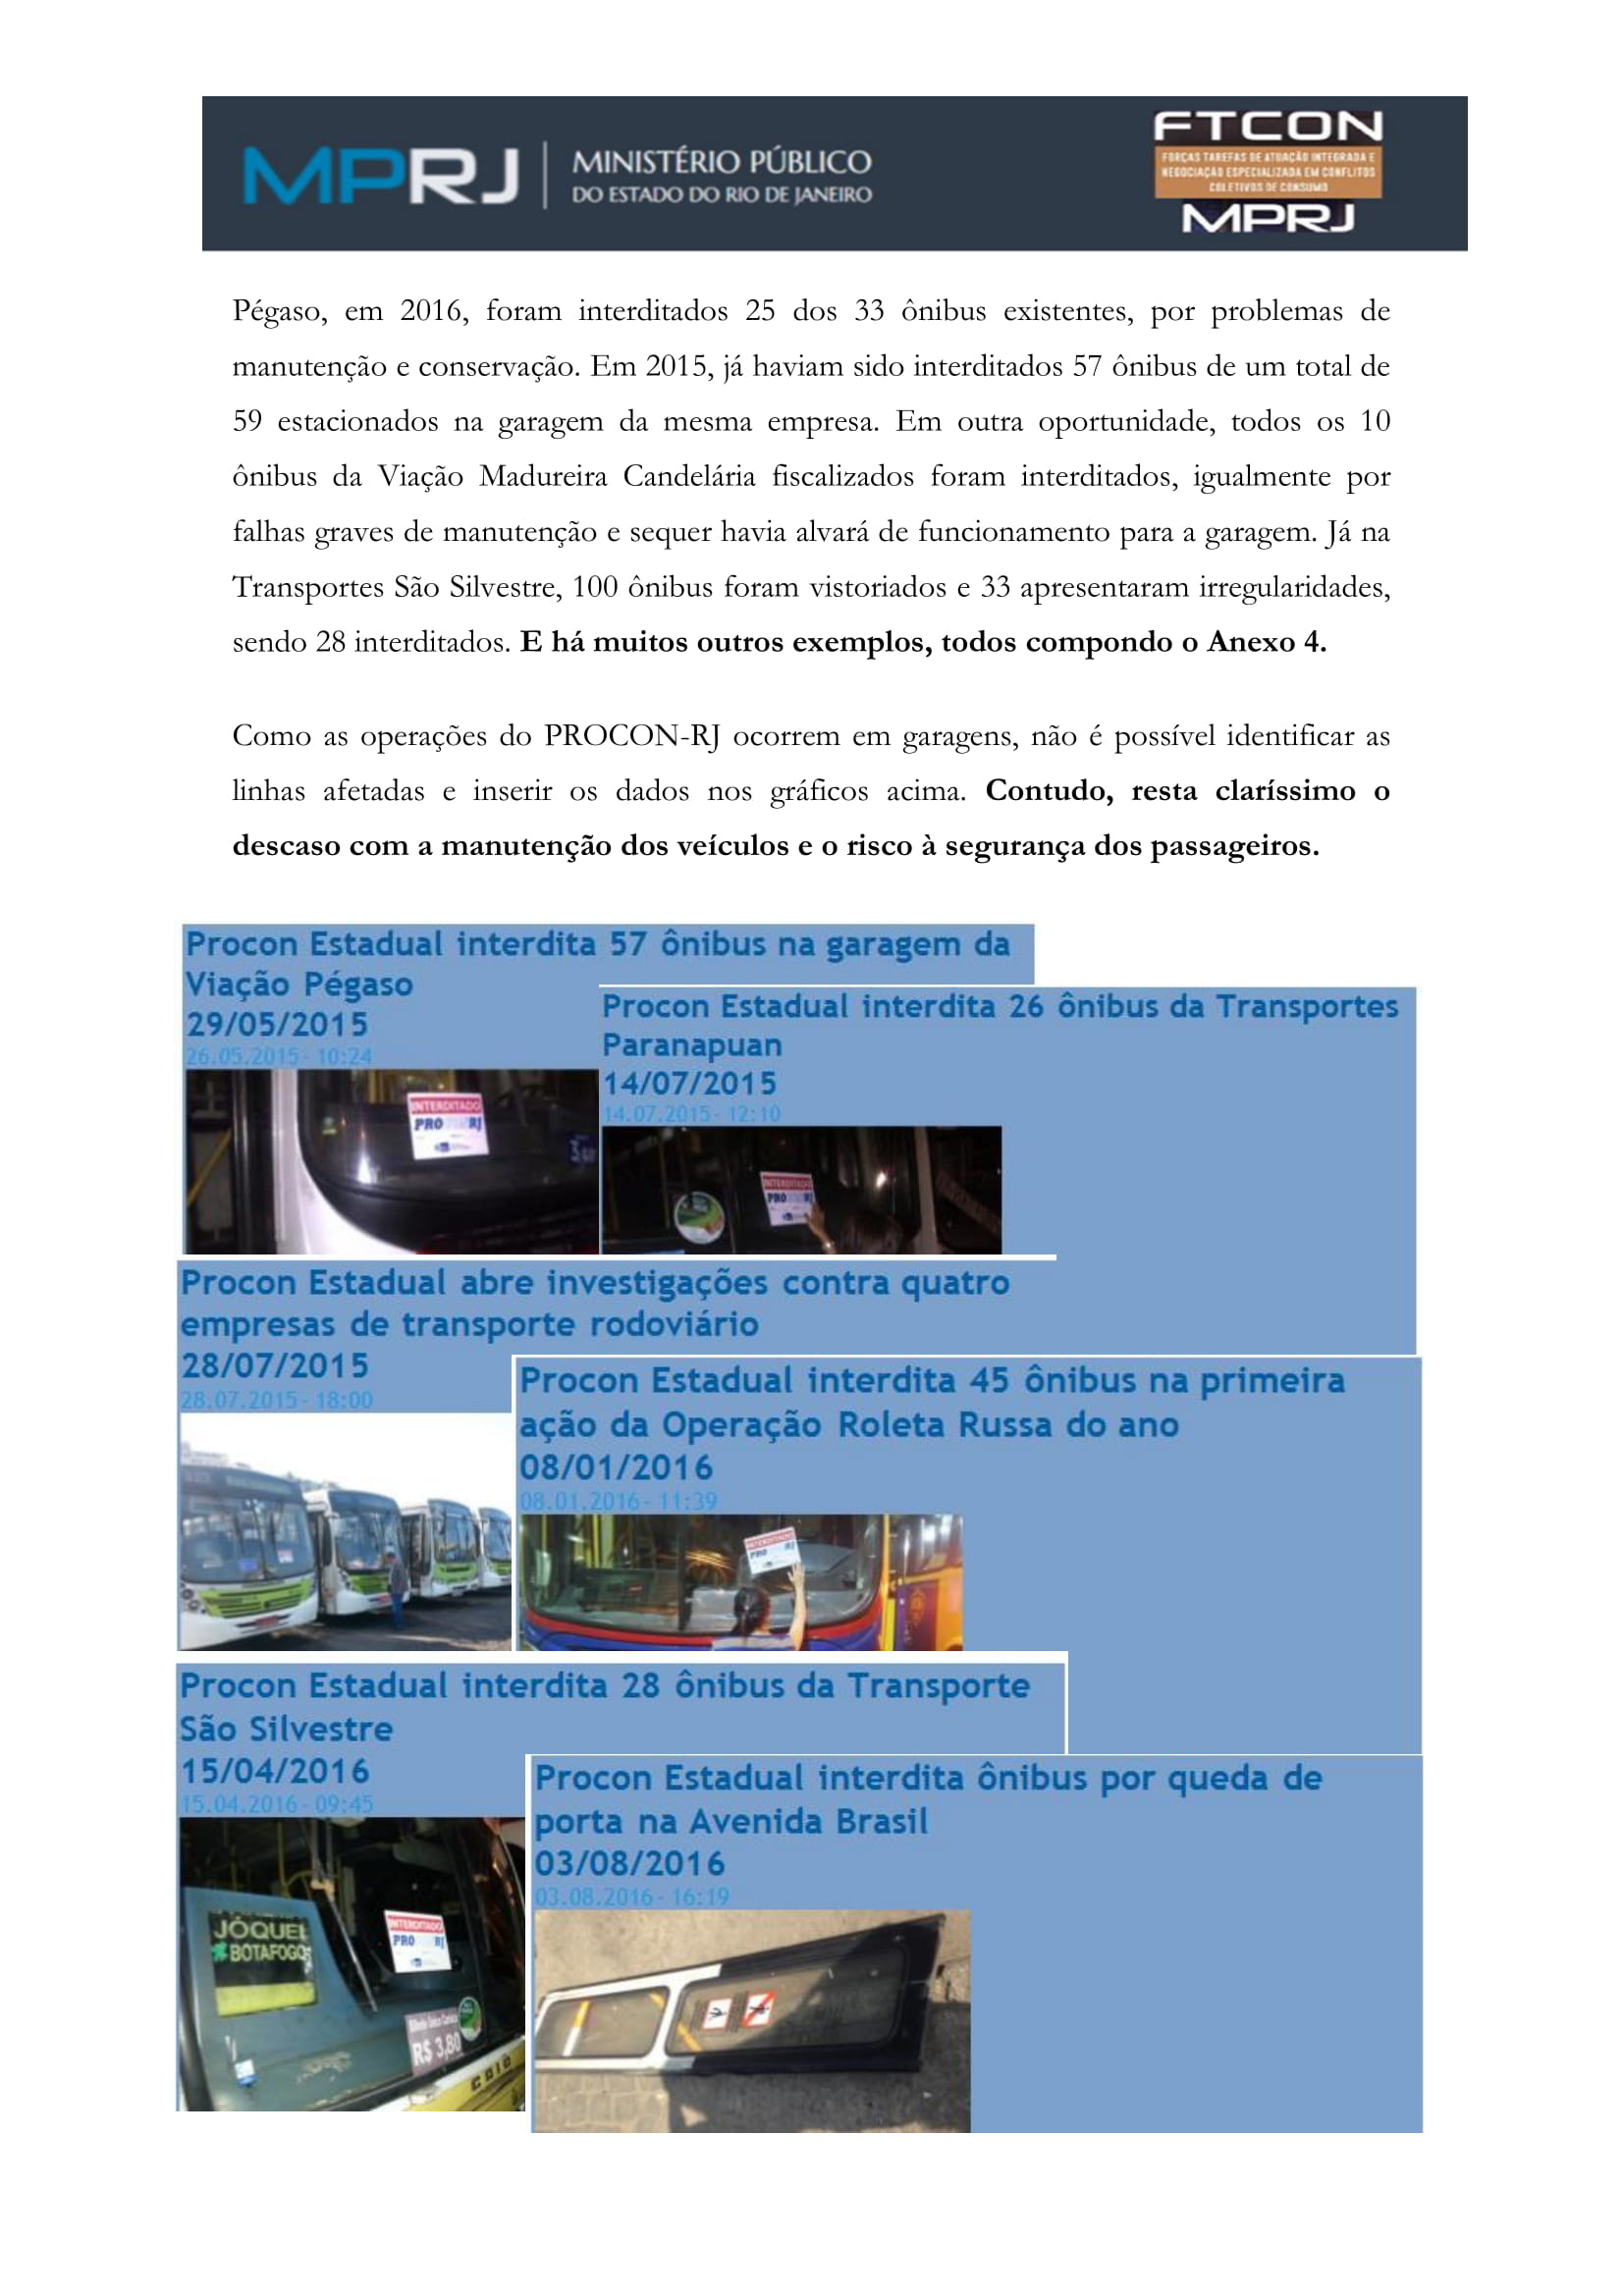 acp_caducidade_onibus_dr_rt-029